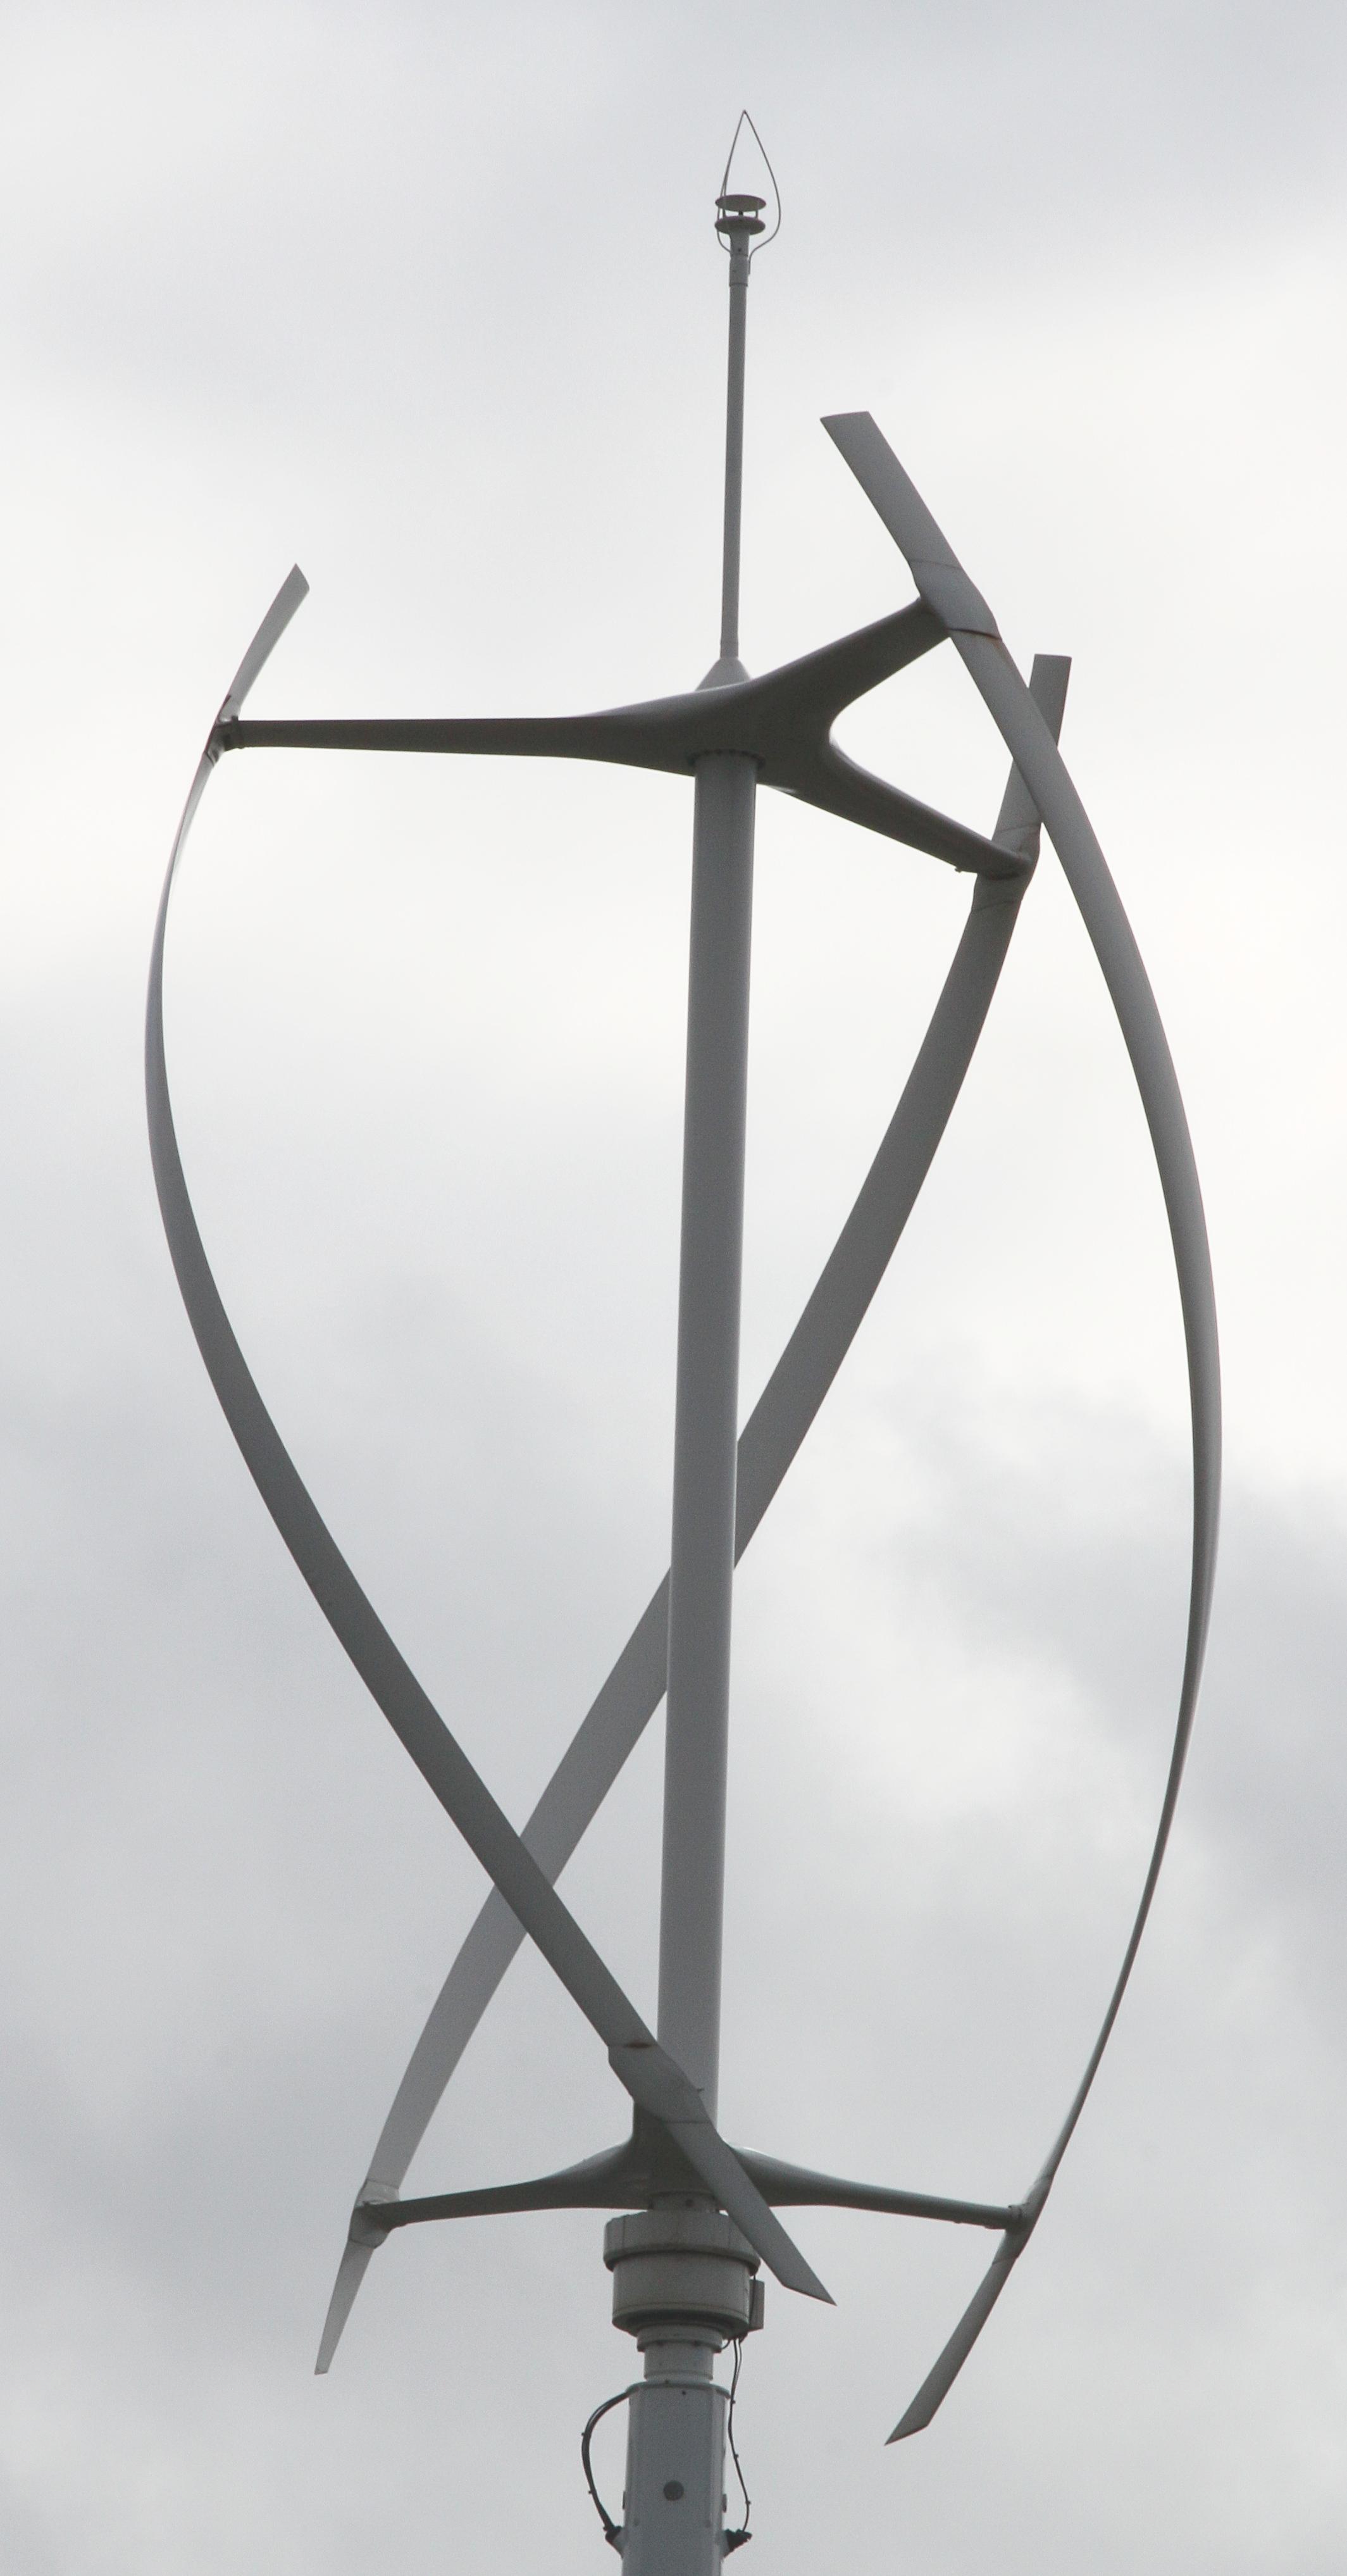 Gorlov helical turbine - Wikiwand